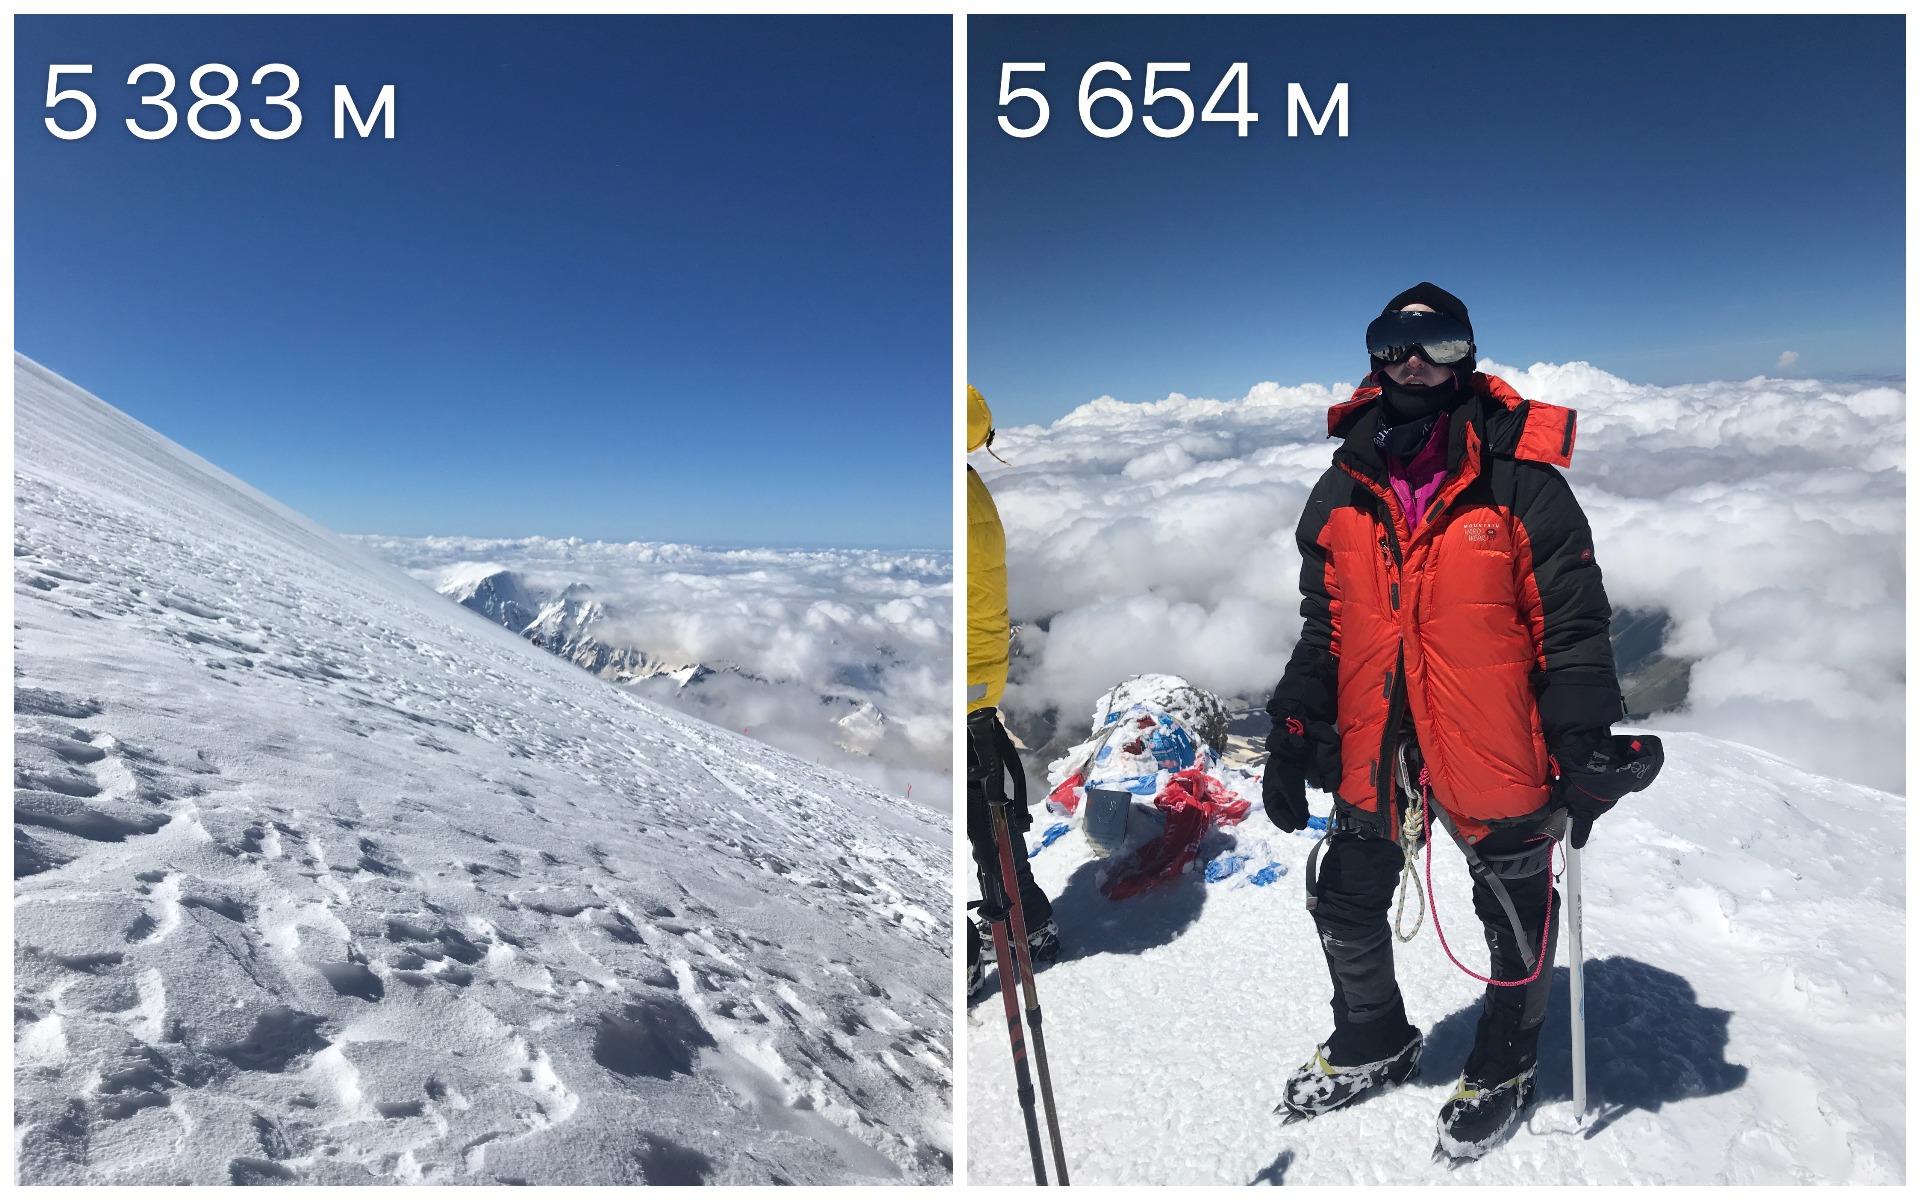 Эльбрус горы